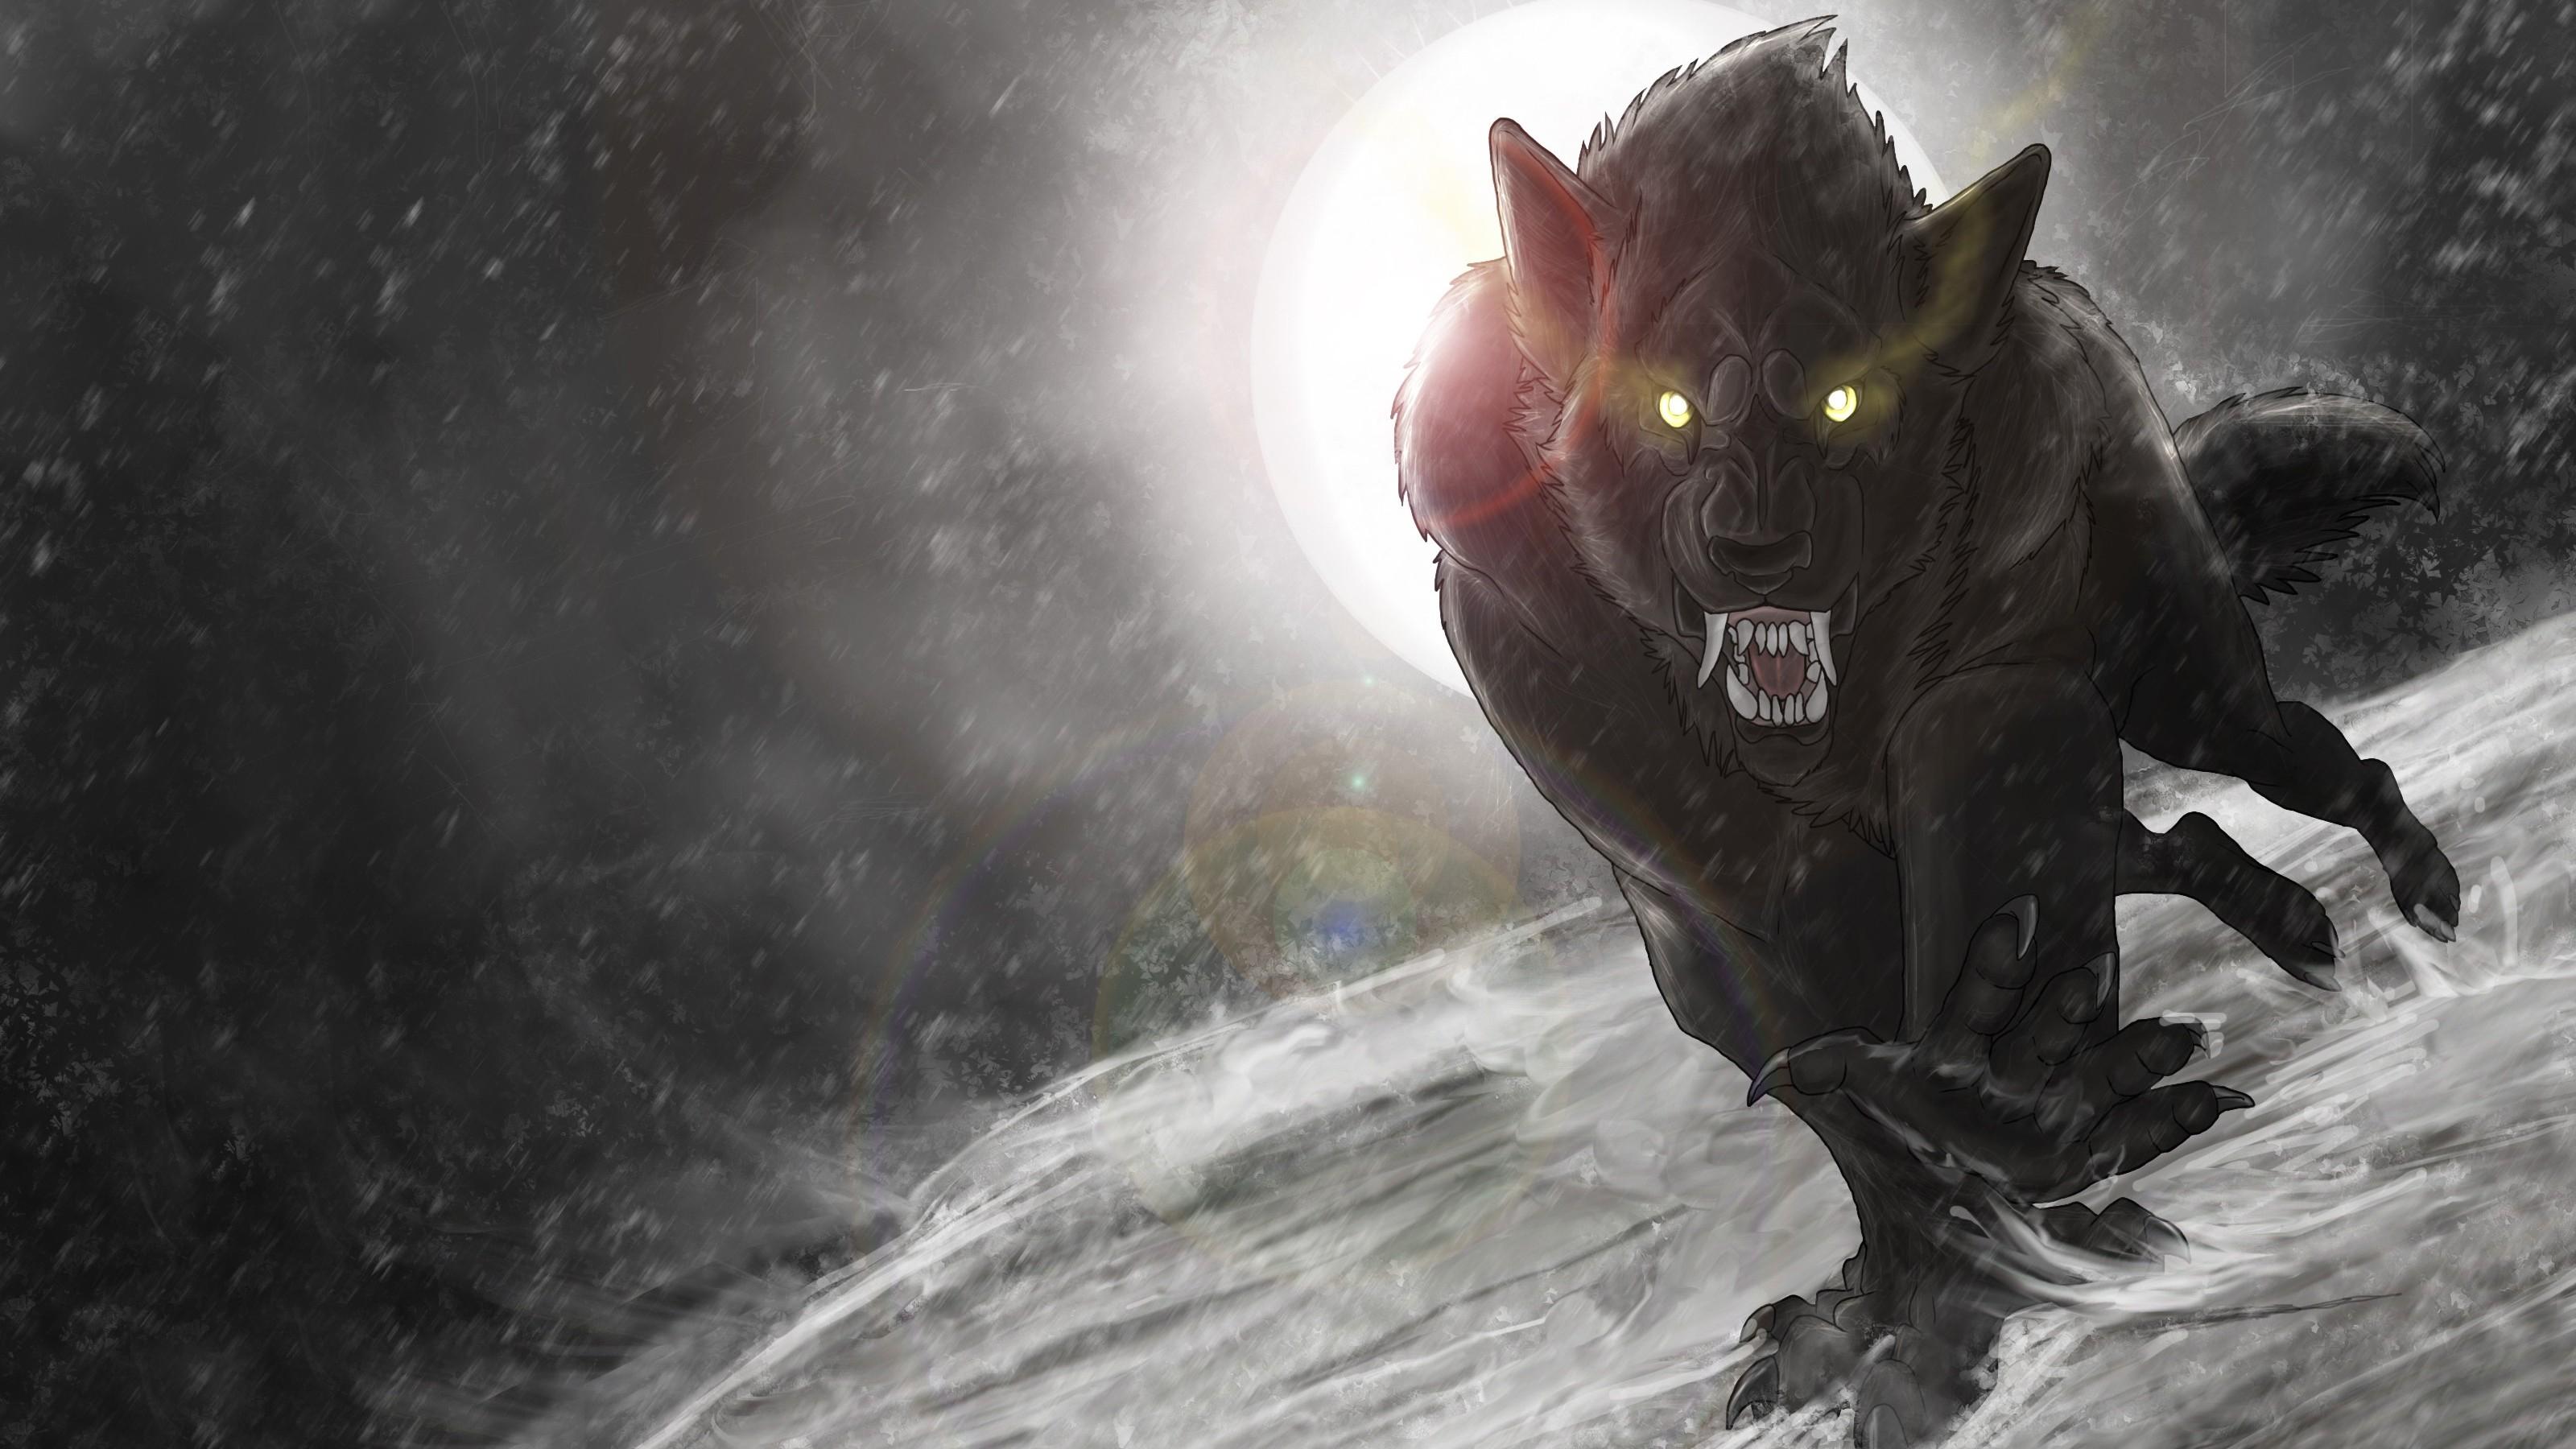 Van Helsing Werewolf Wallpapers | HD Wallpapers | Pinterest | Werewolves  and Wallpaper